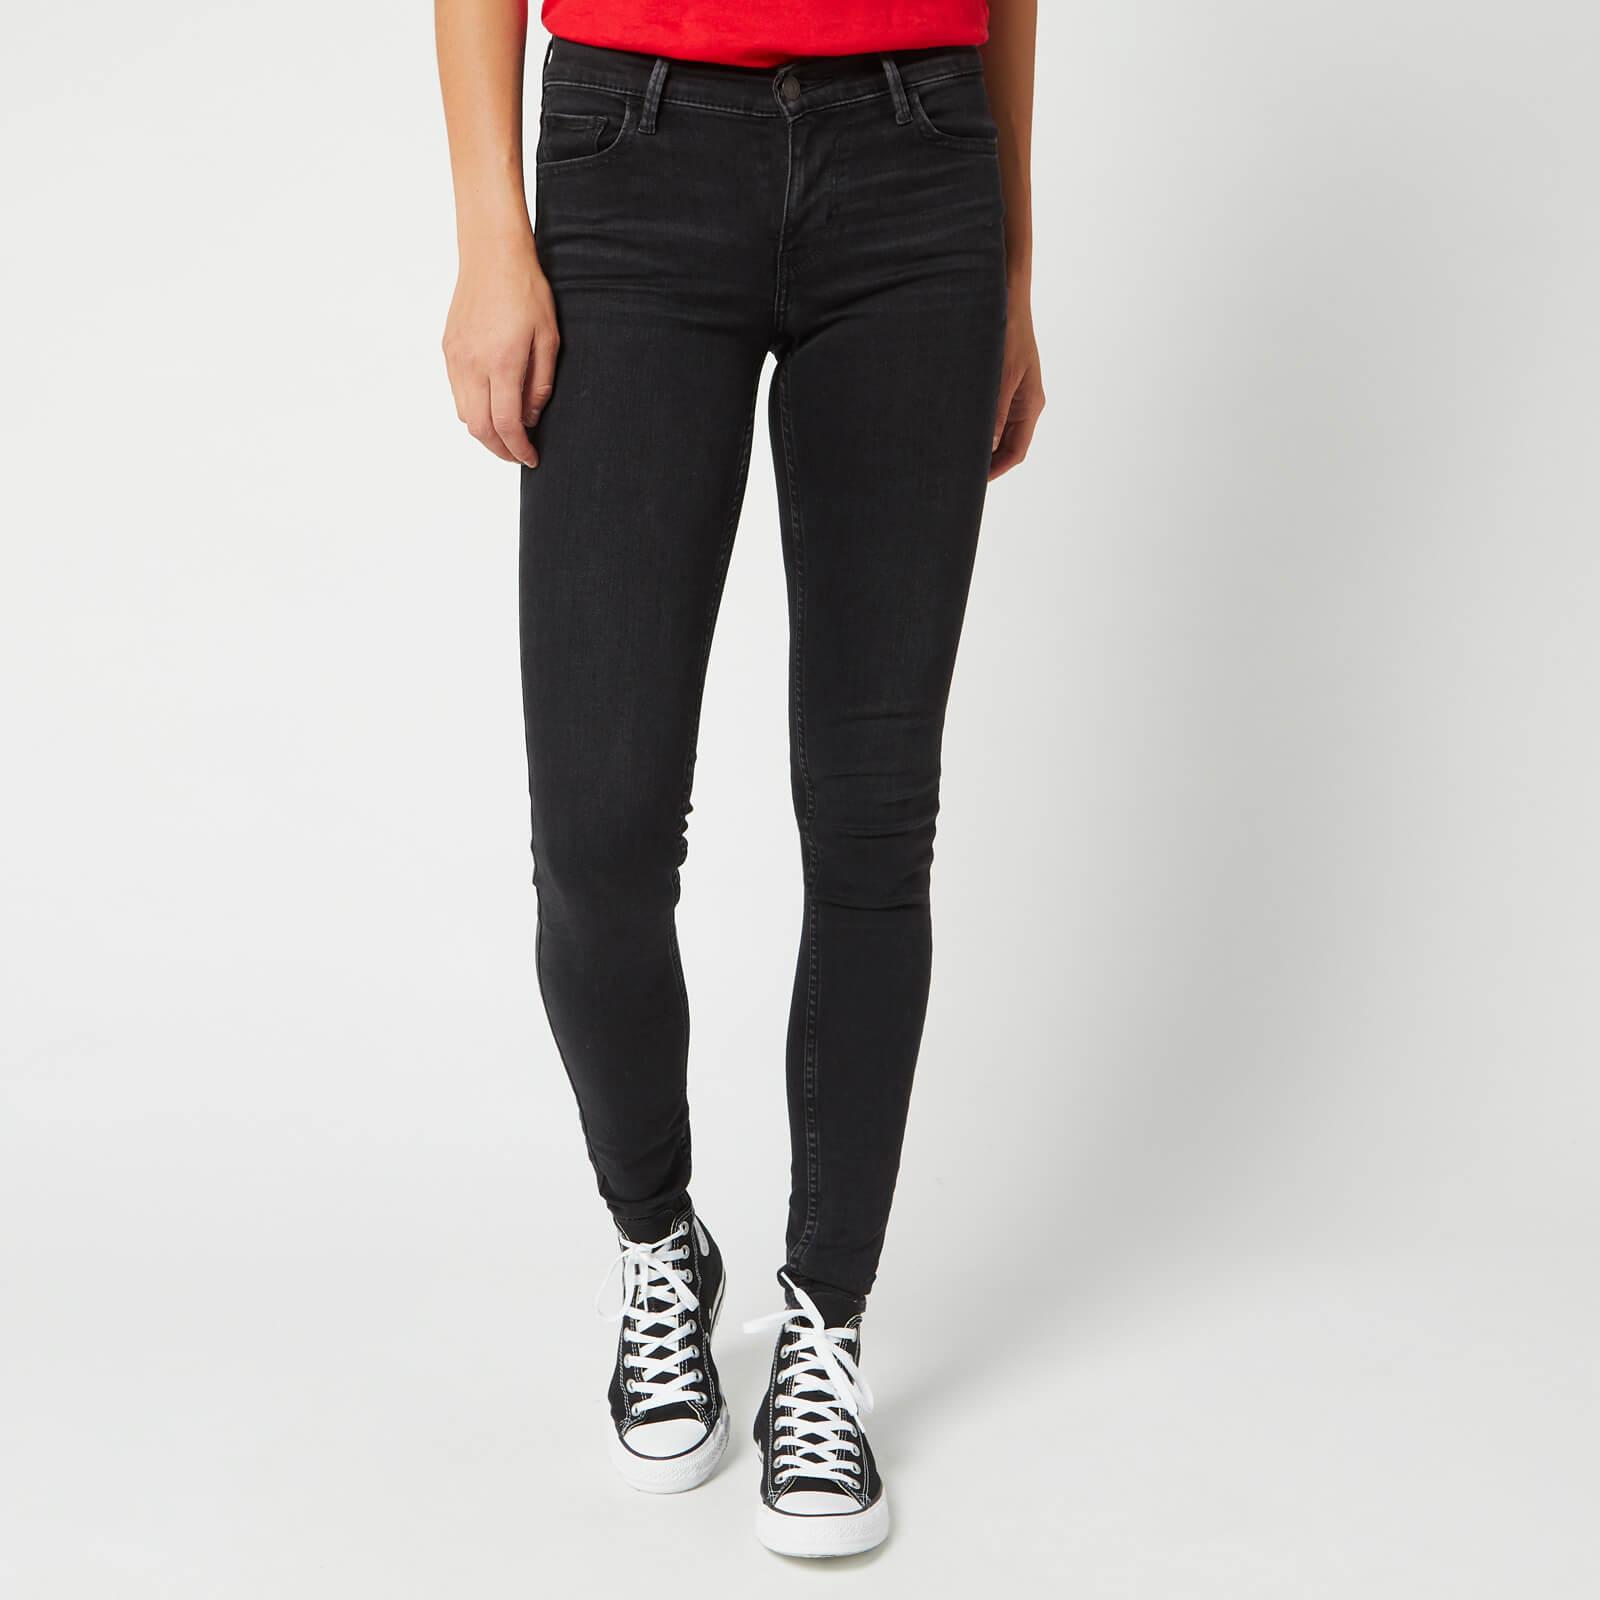 Levi's s Innovation Super Skinny Jeans - Freak Out - W28/L30